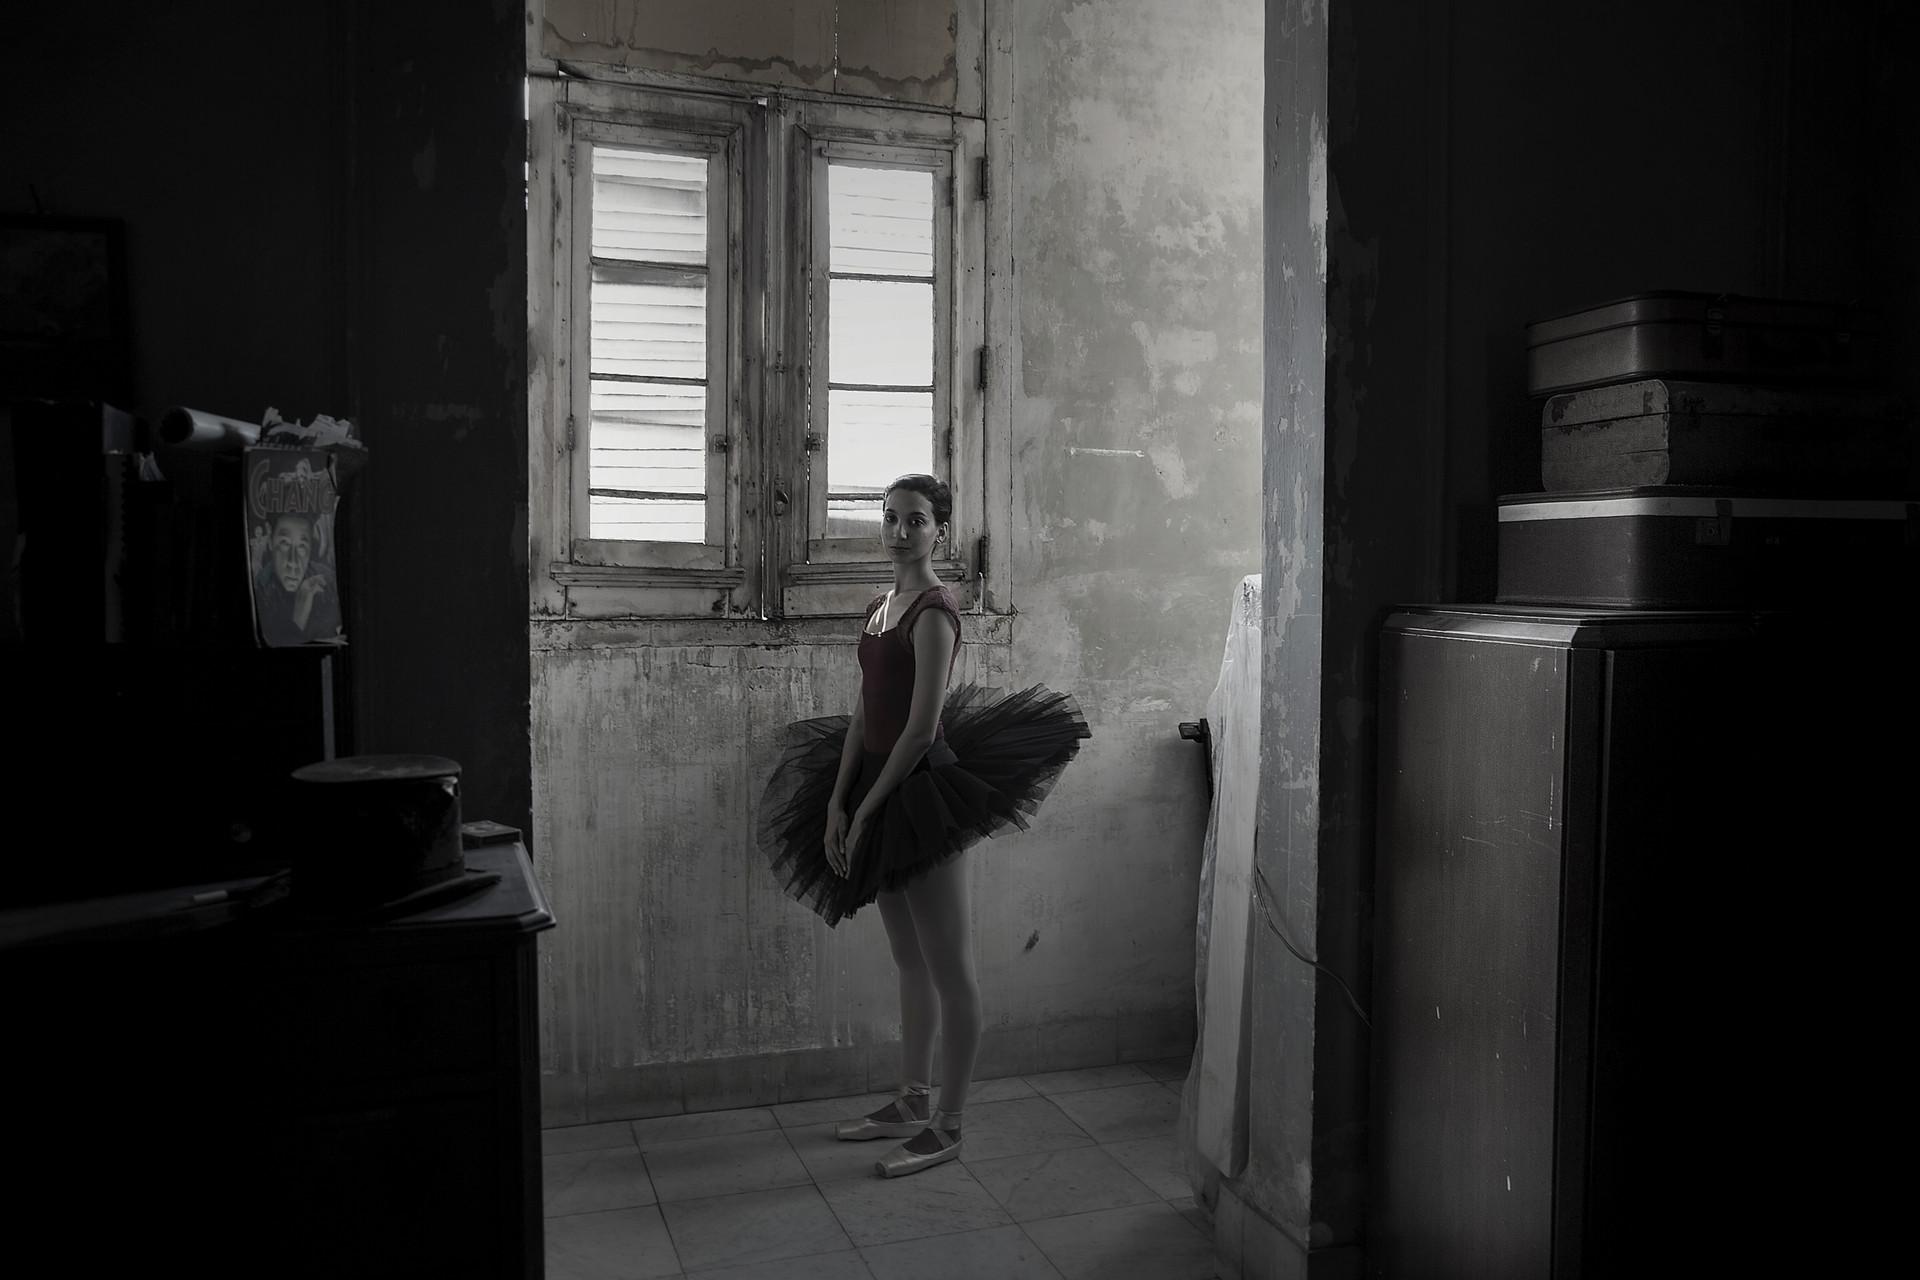 Kitchen of old mansion, Havana